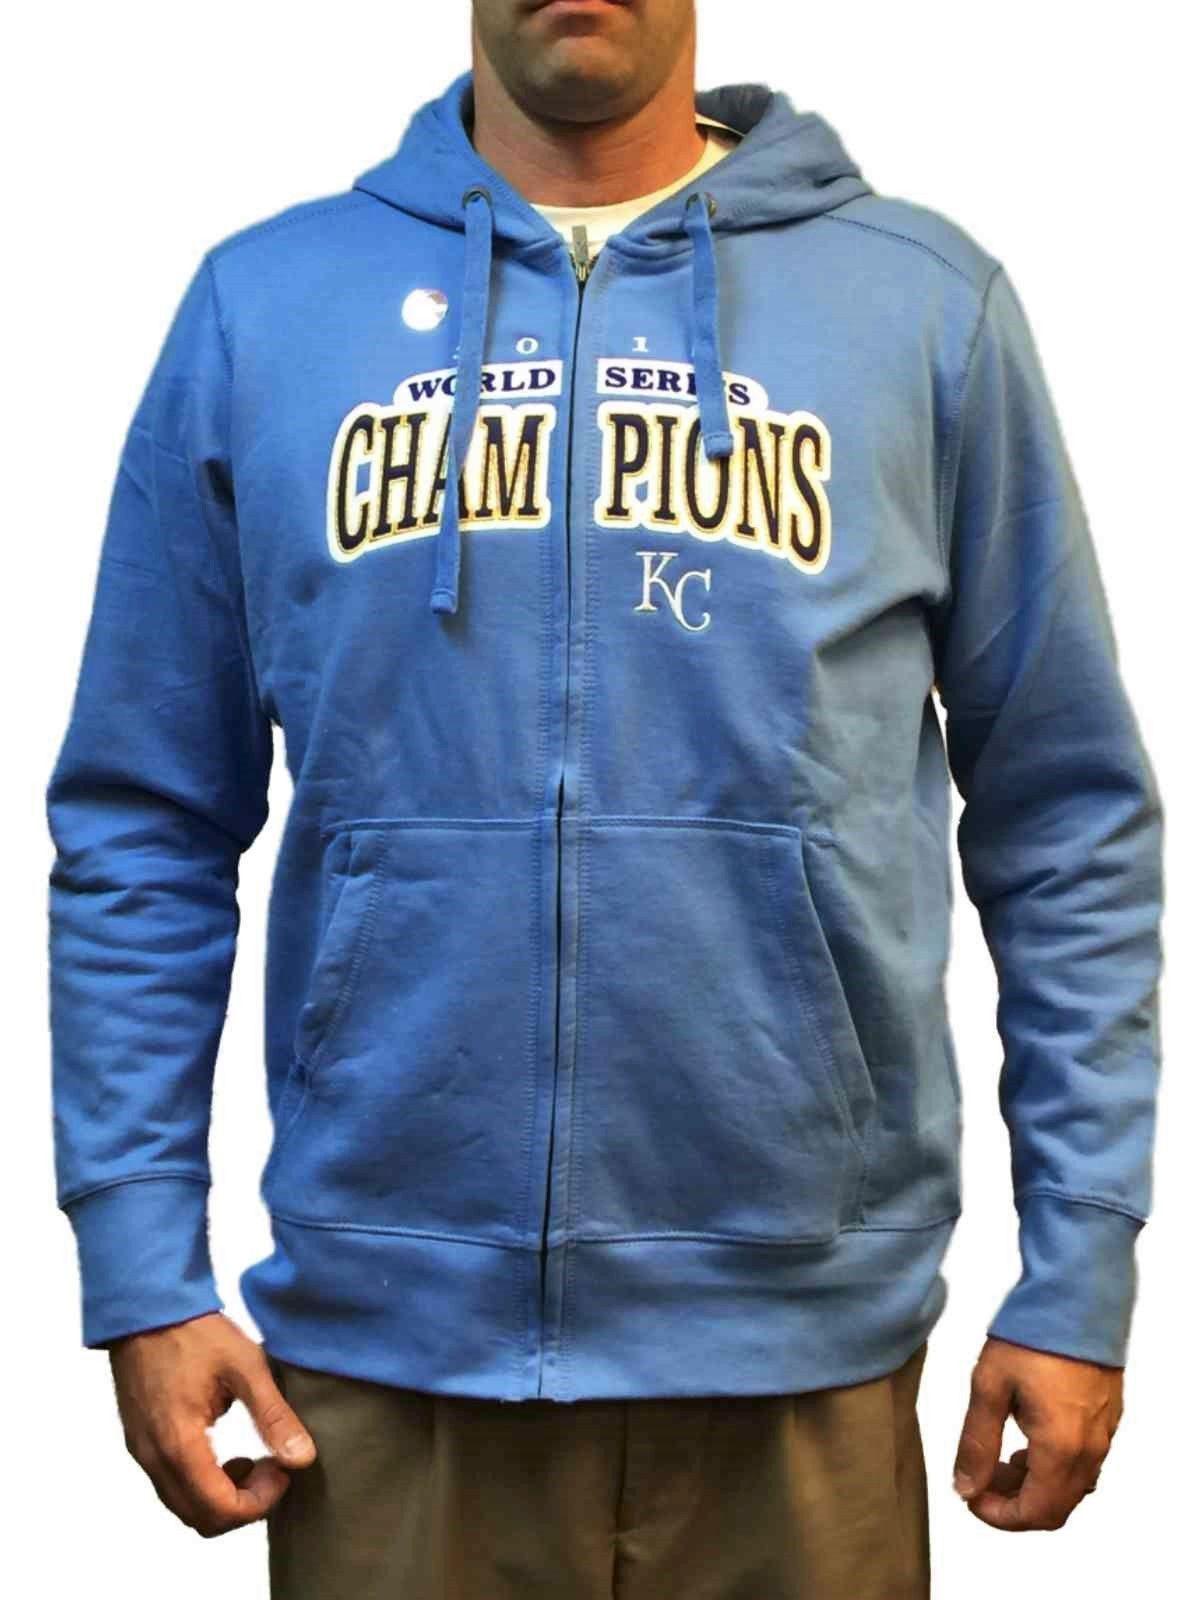 Kansas City Royals Antigua 2015 World Series Champions Hoodie Jacket  Sweatshirt